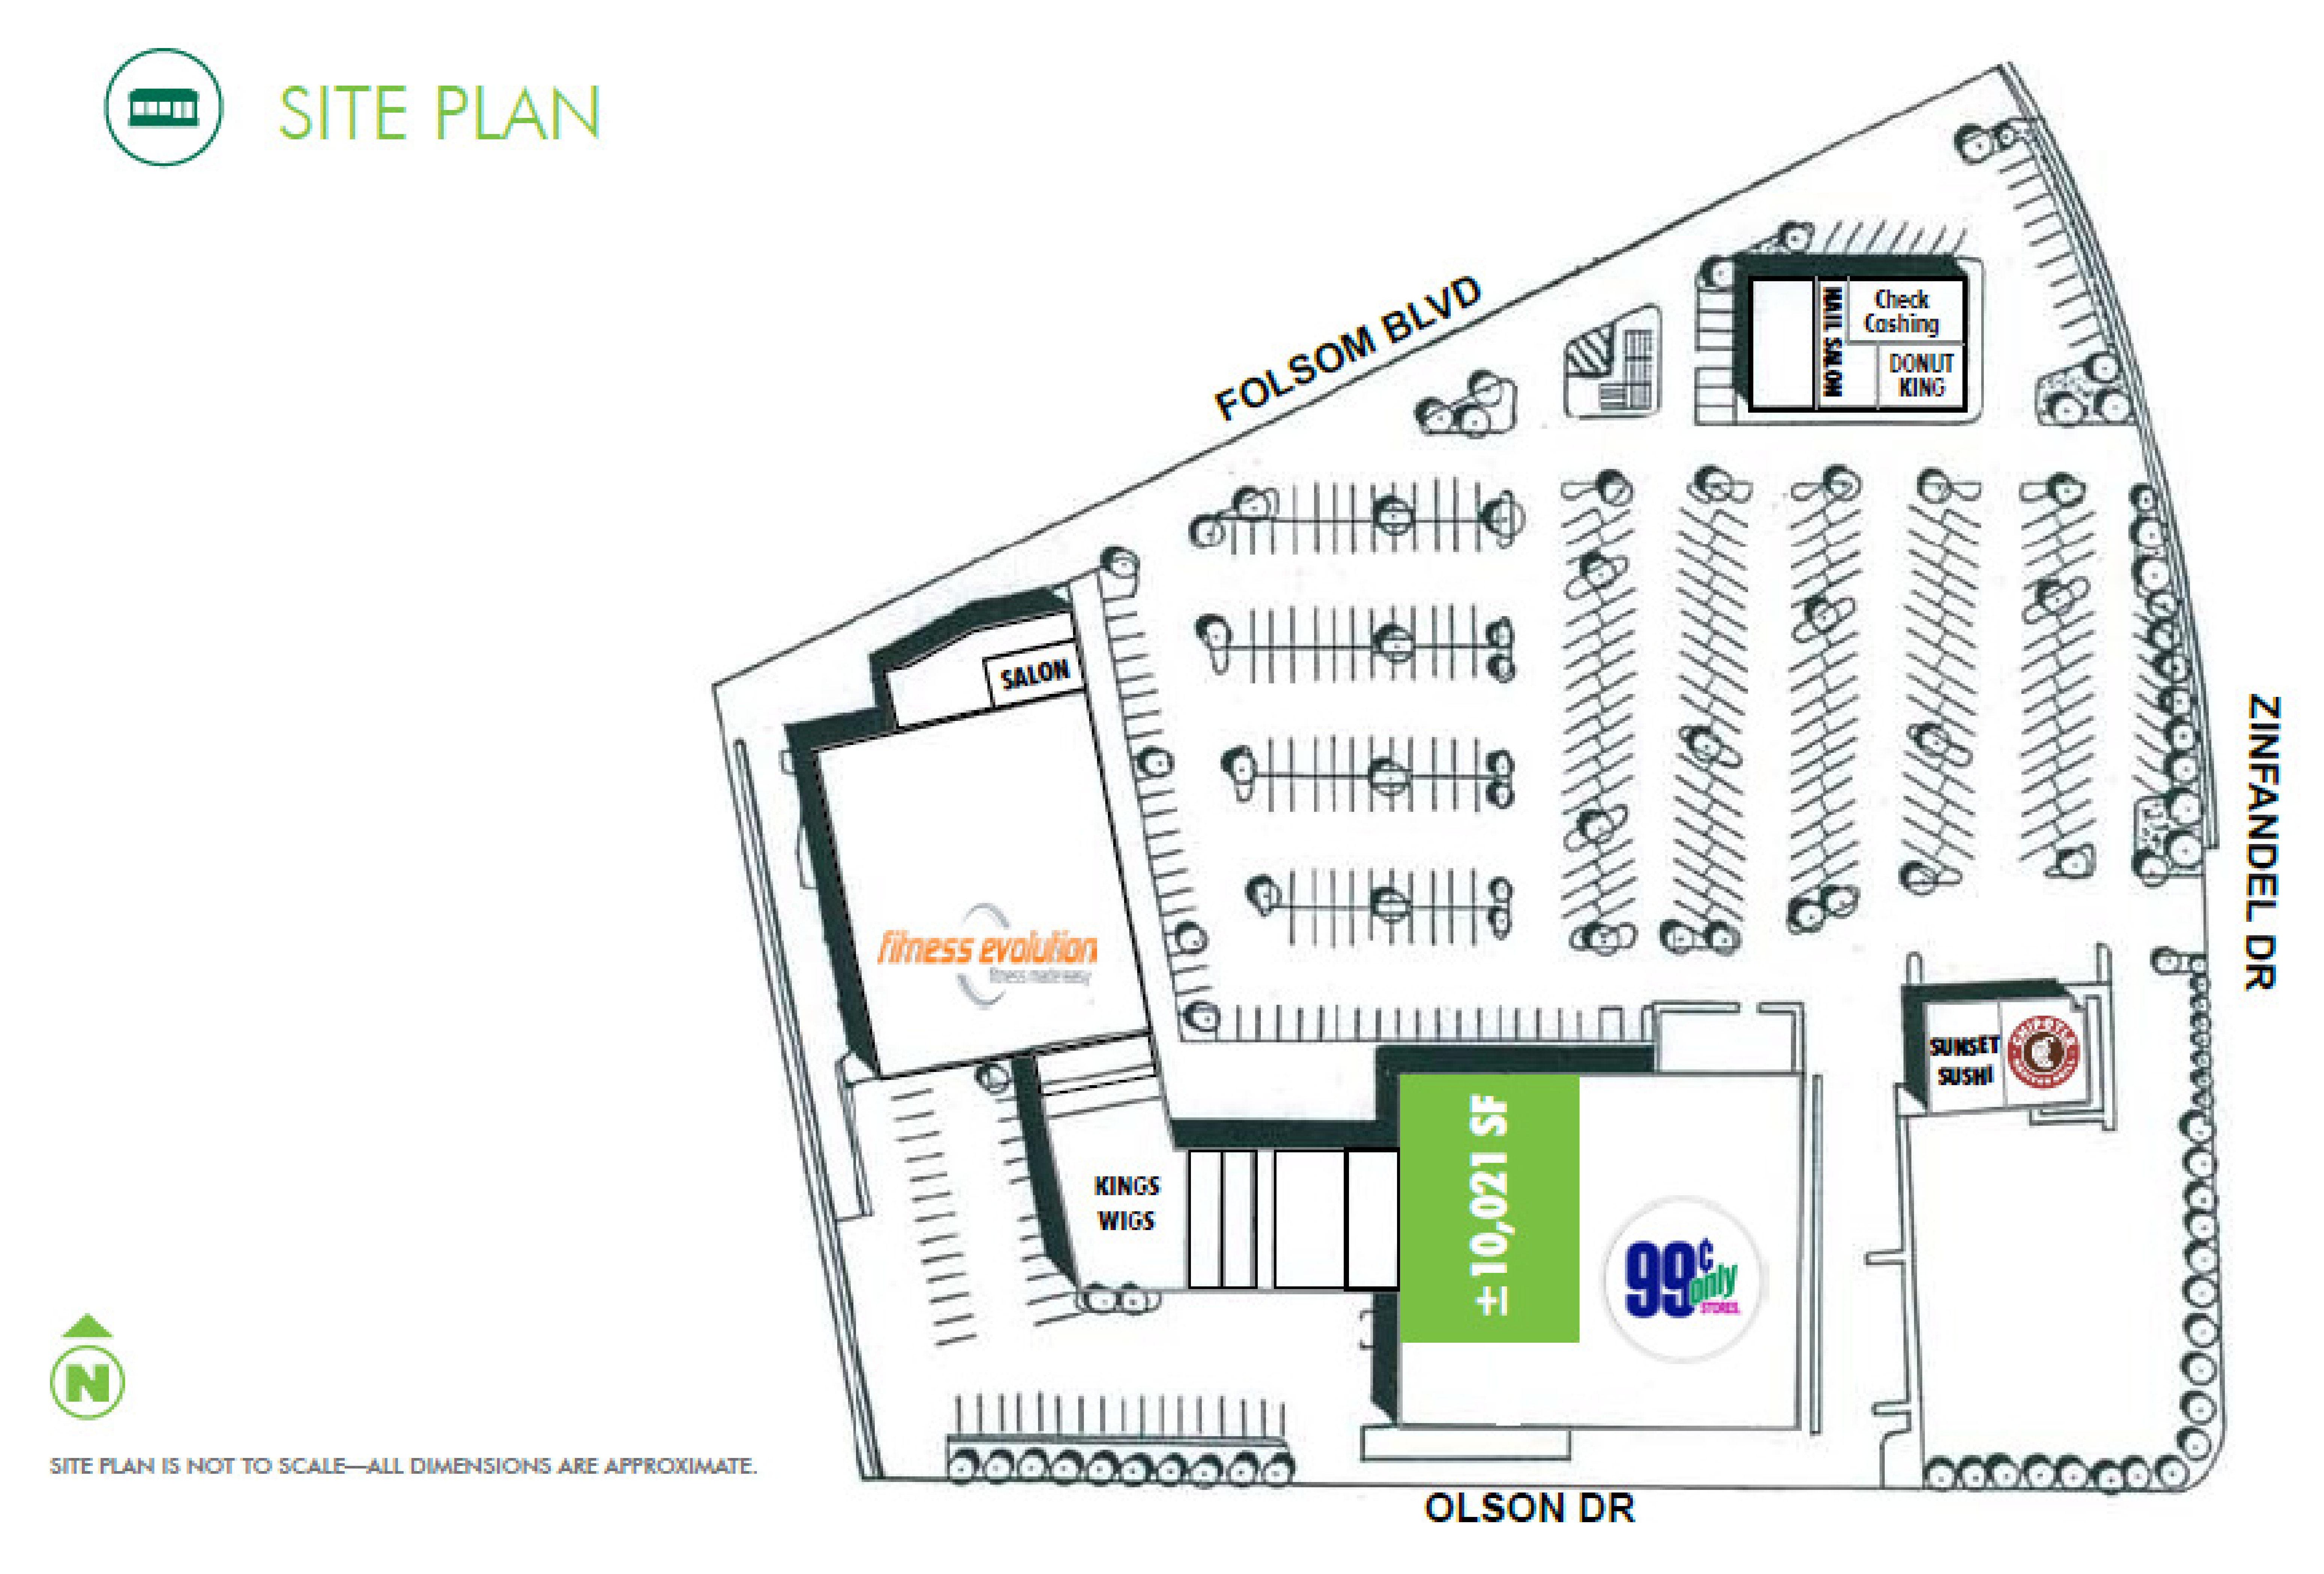 Ross Plaza: site plan